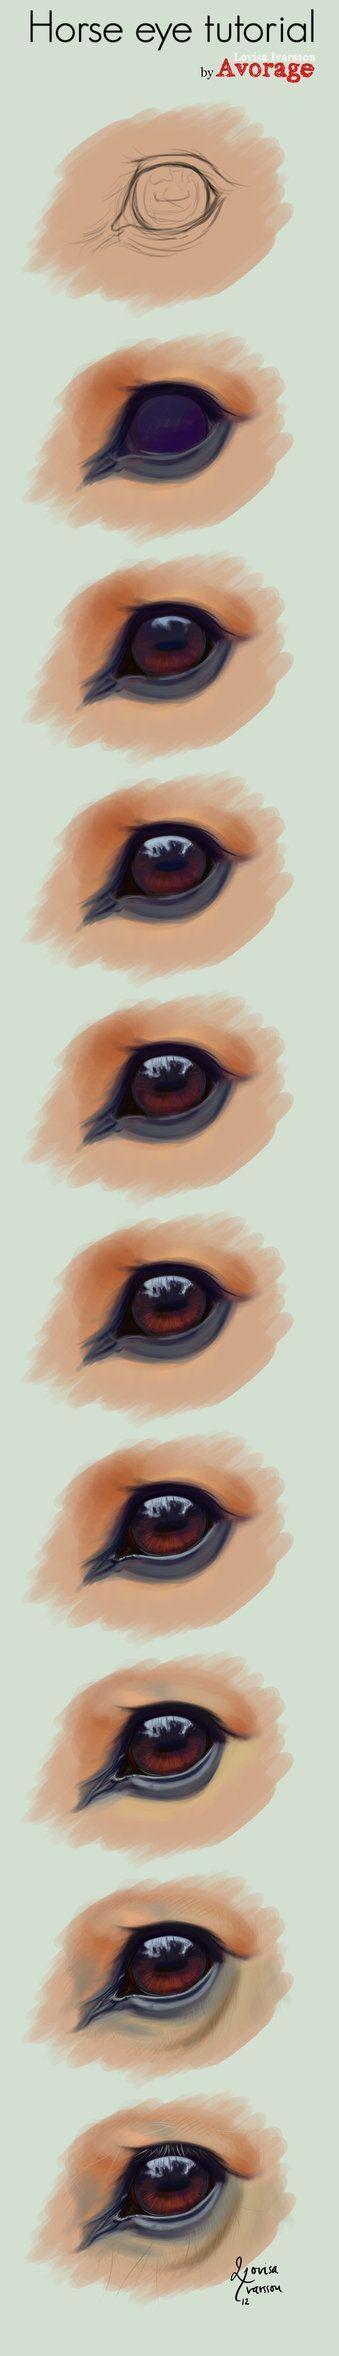 horse drawing tutorial horse eye